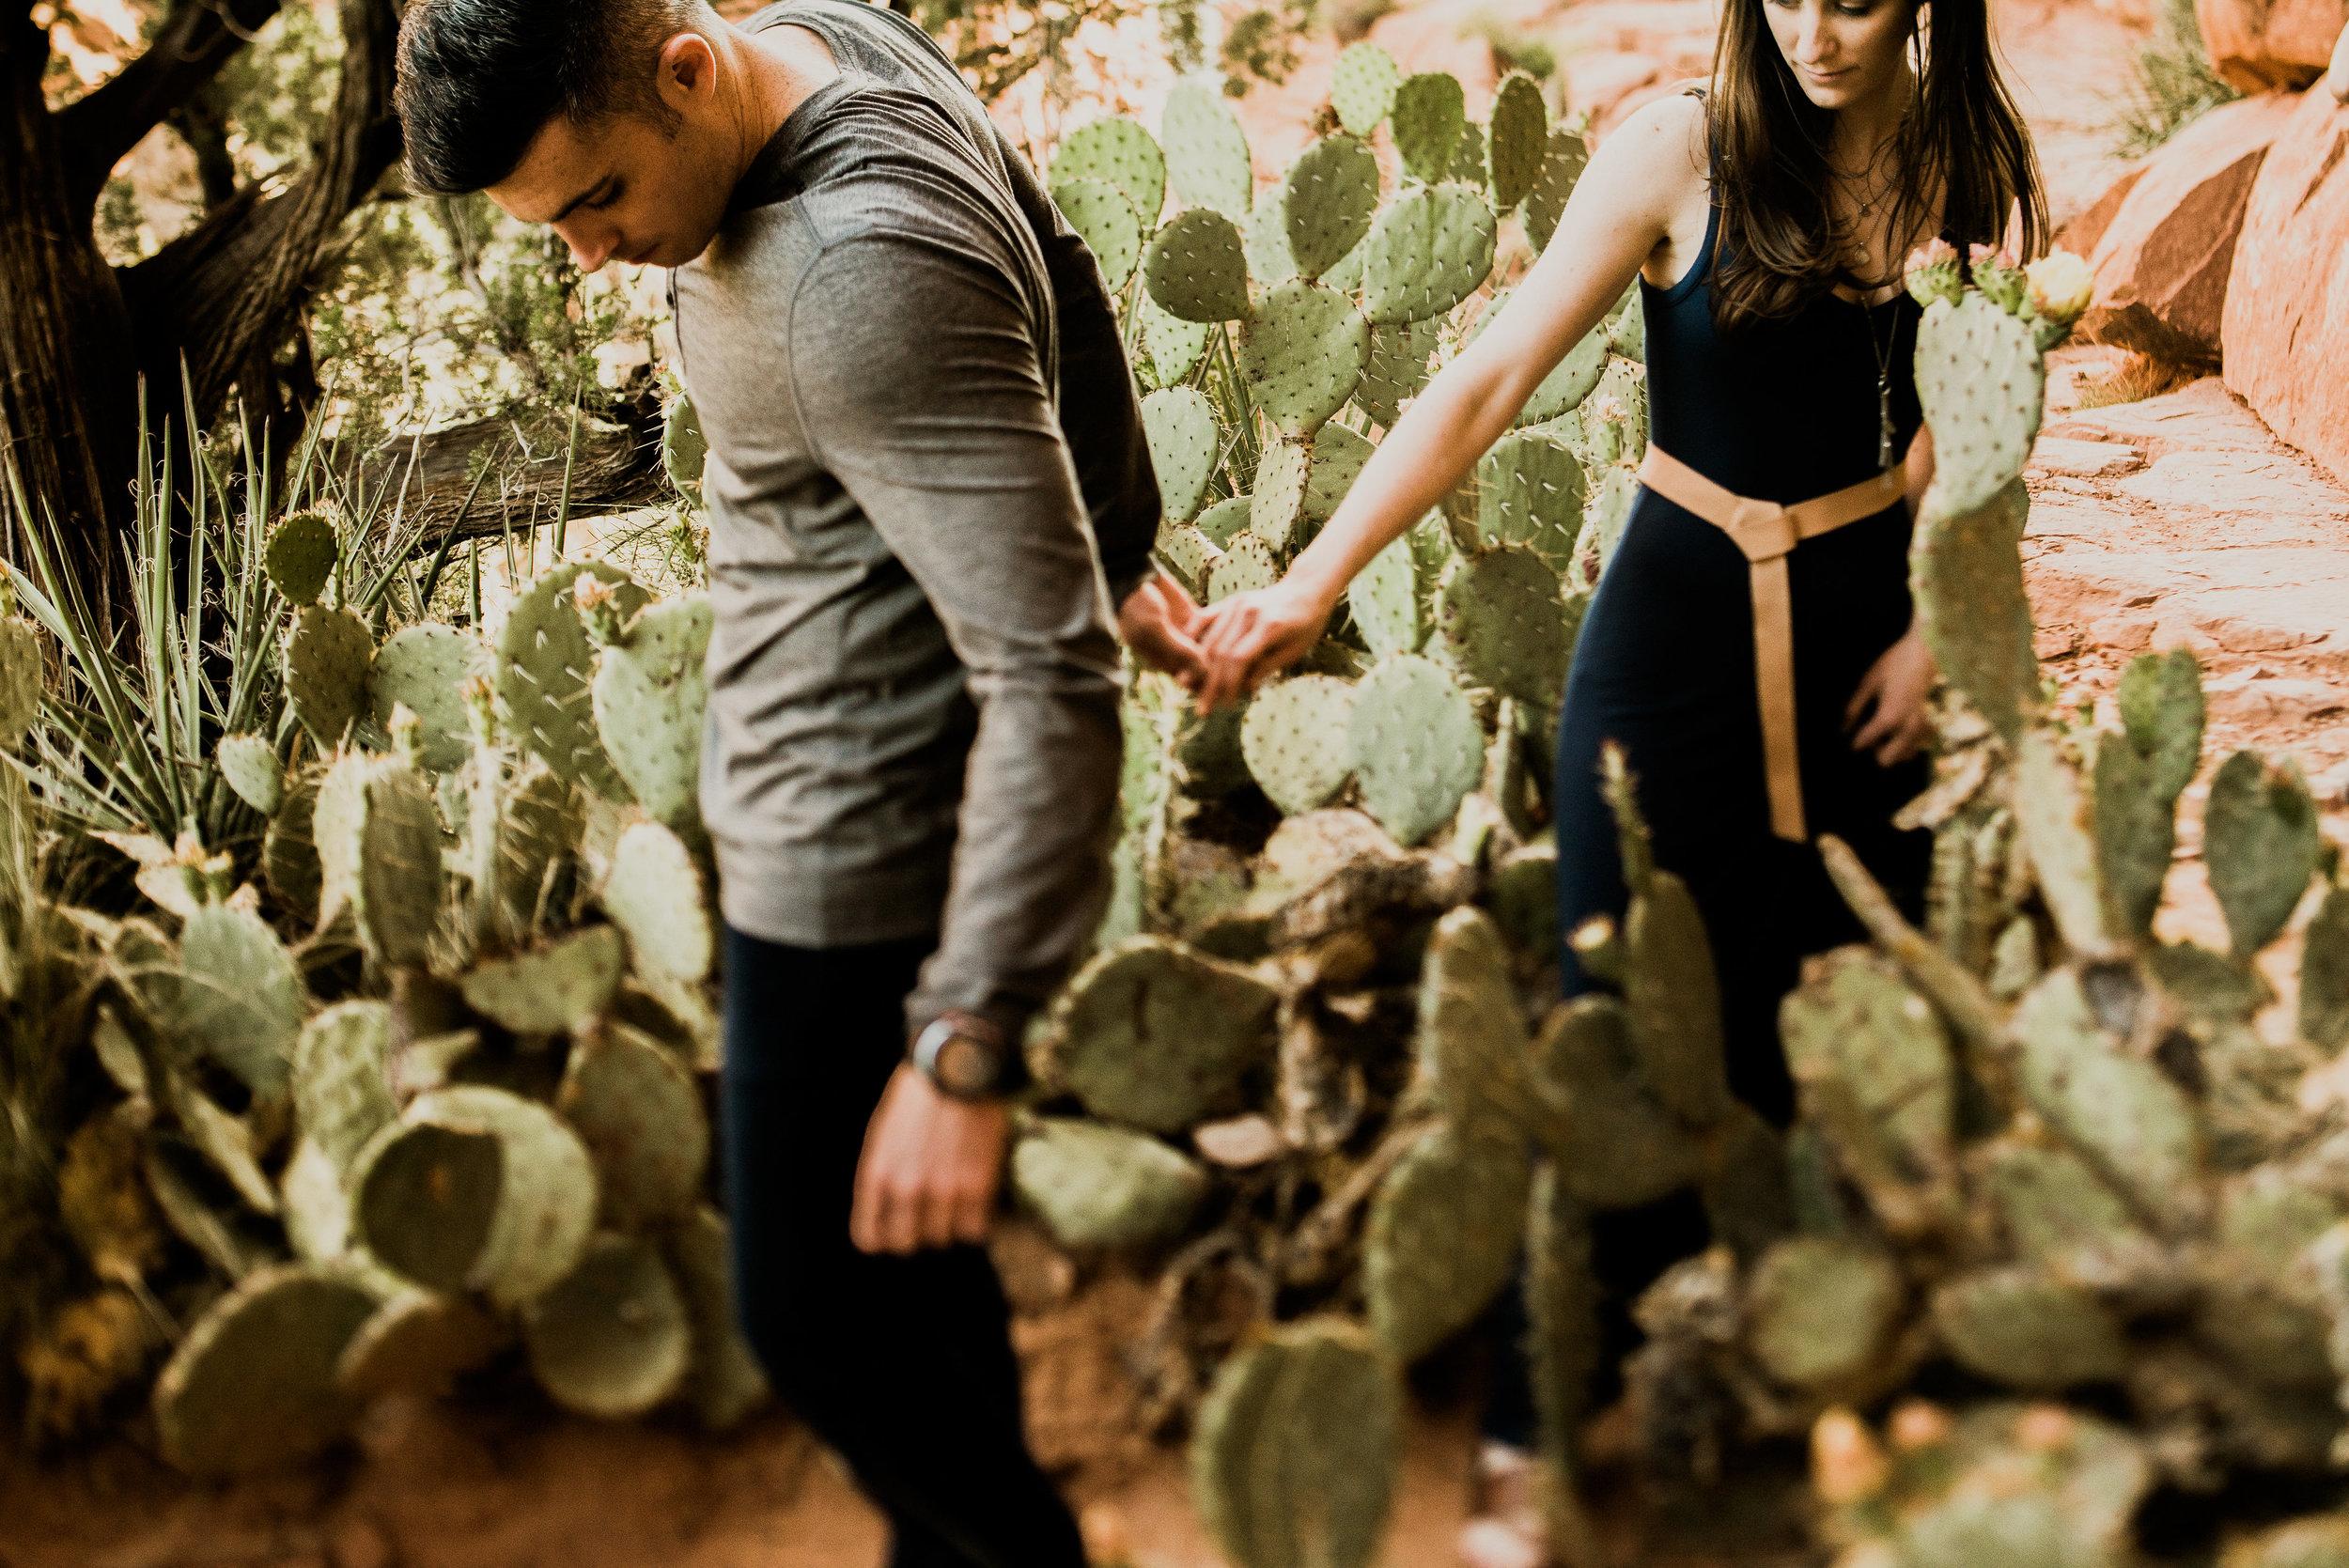 Isaiah-&-Taylor-Photography---Paul-&-Karen-Engagement,-Sedona-Arizona-123.jpg